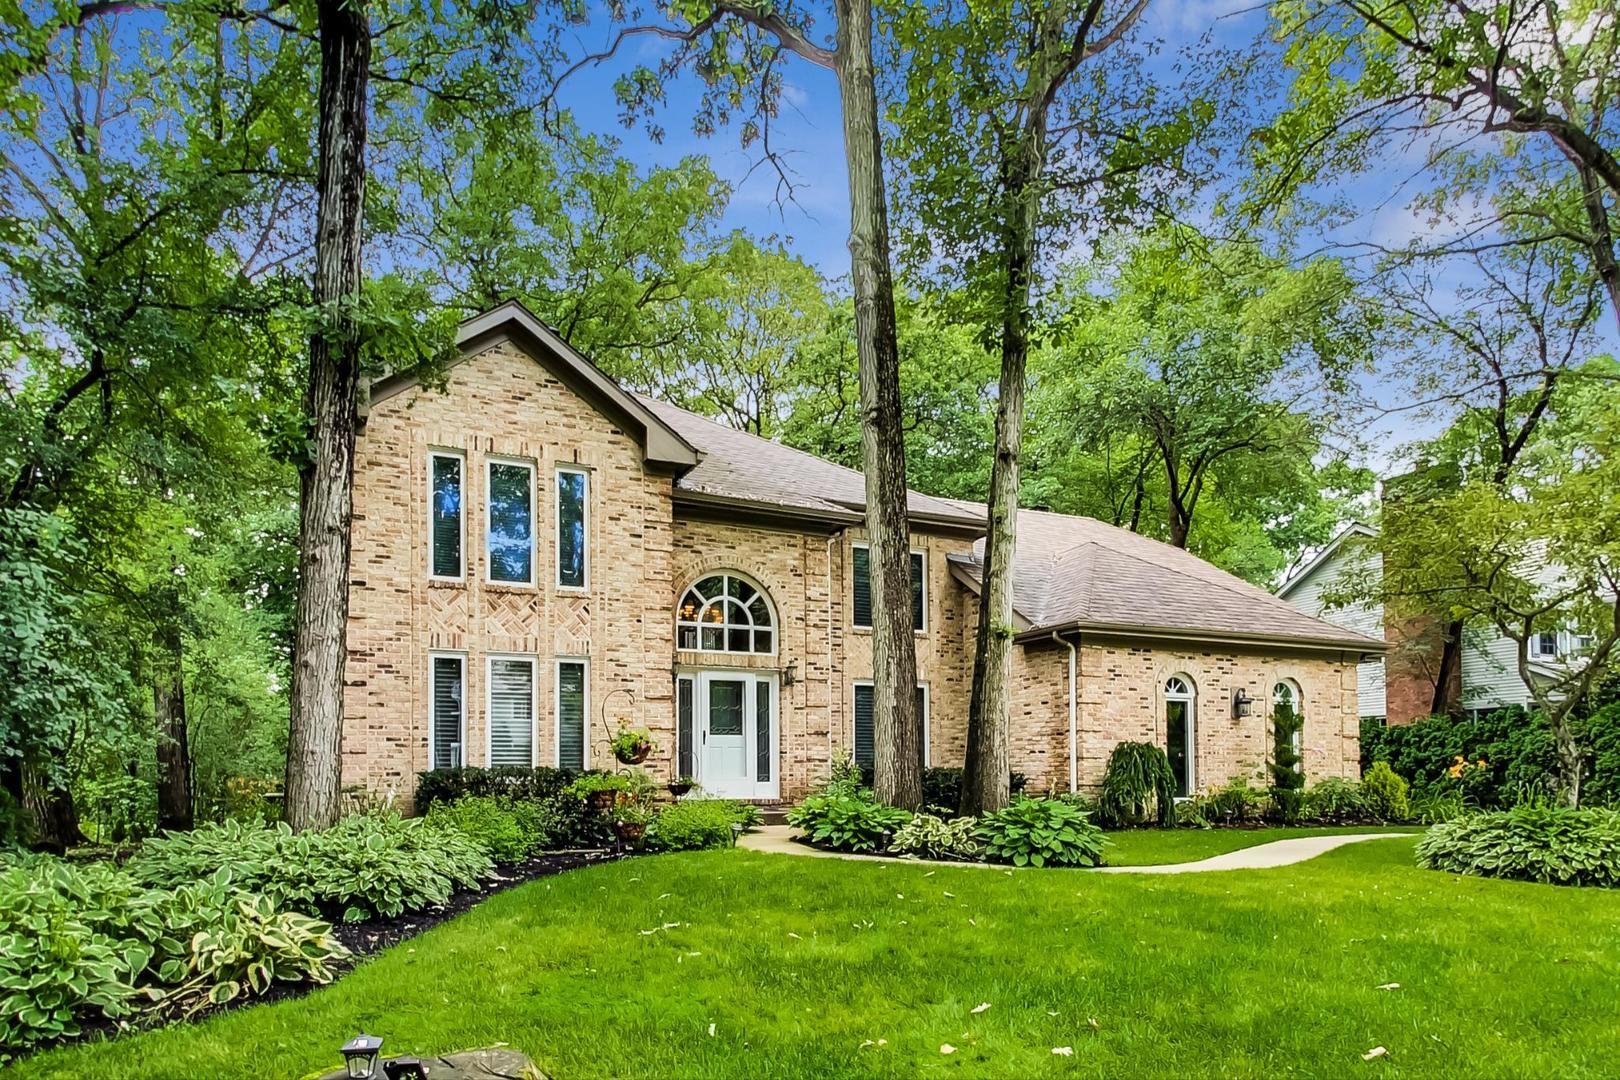 1140 Mount Vernon Avenue, Lake Forest, IL 60045 - MLS#: 10777683